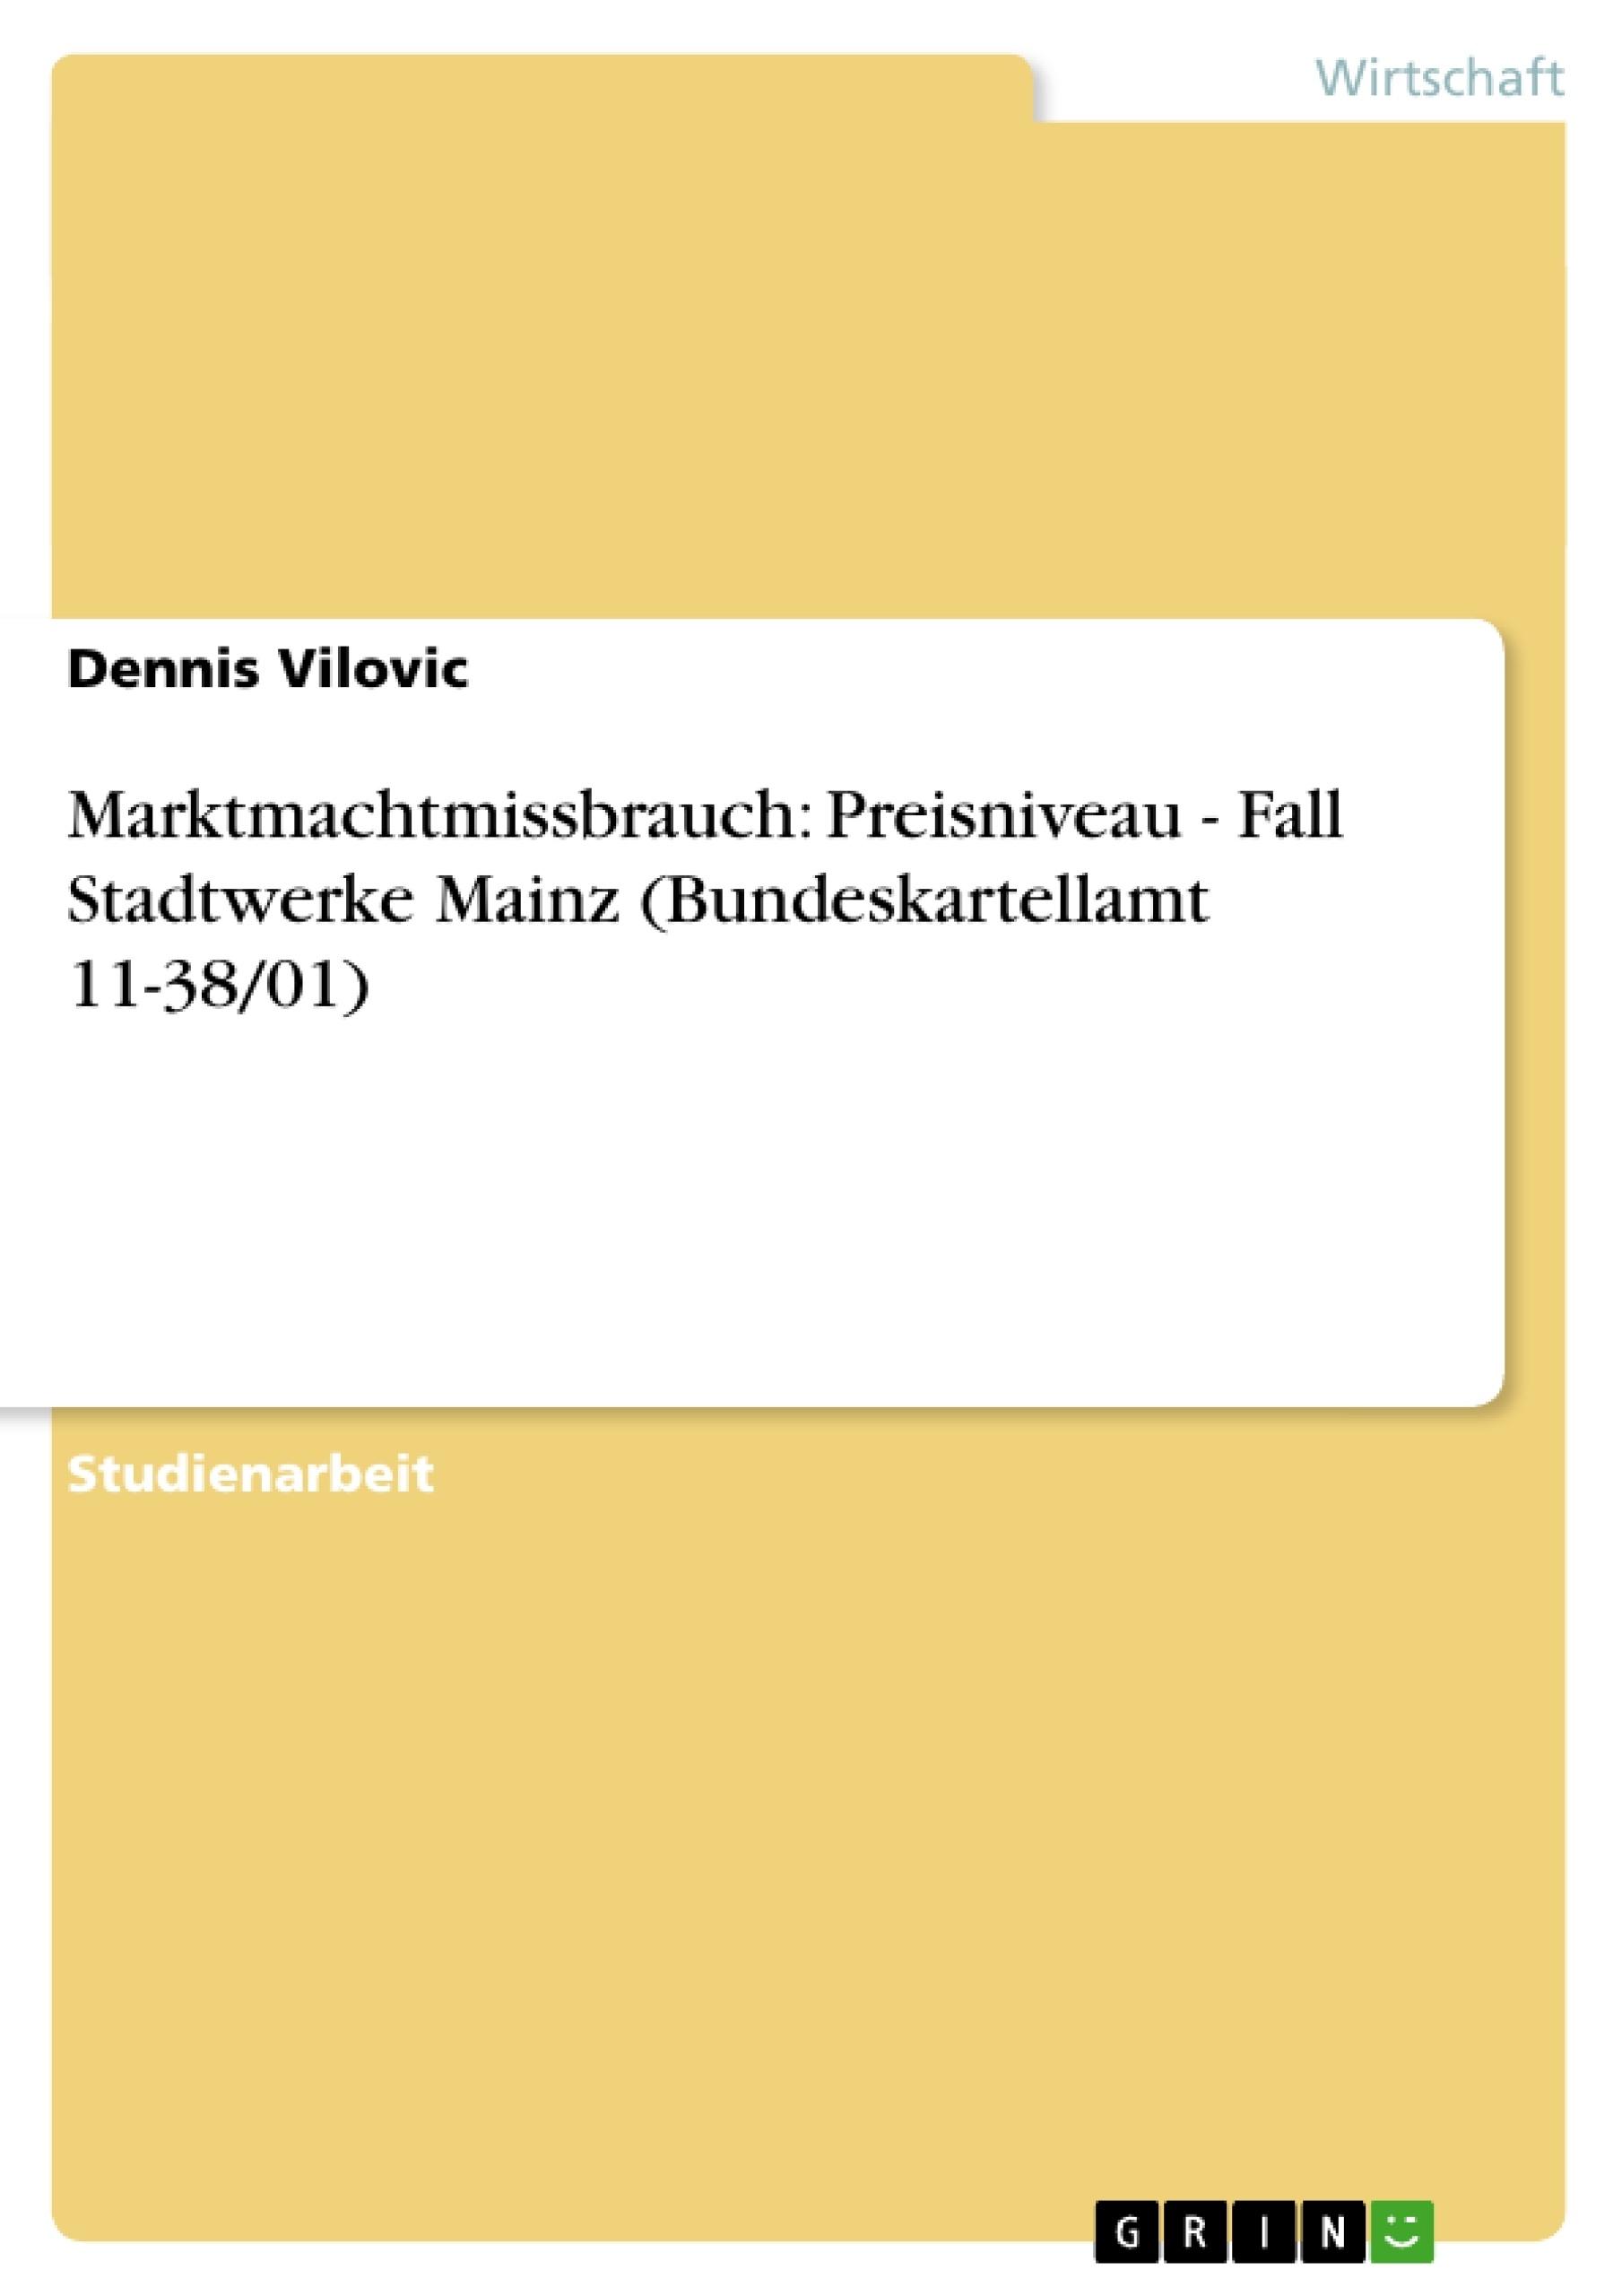 Titel: Marktmachtmissbrauch: Preisniveau - Fall Stadtwerke Mainz (Bundeskartellamt 11-38/01)